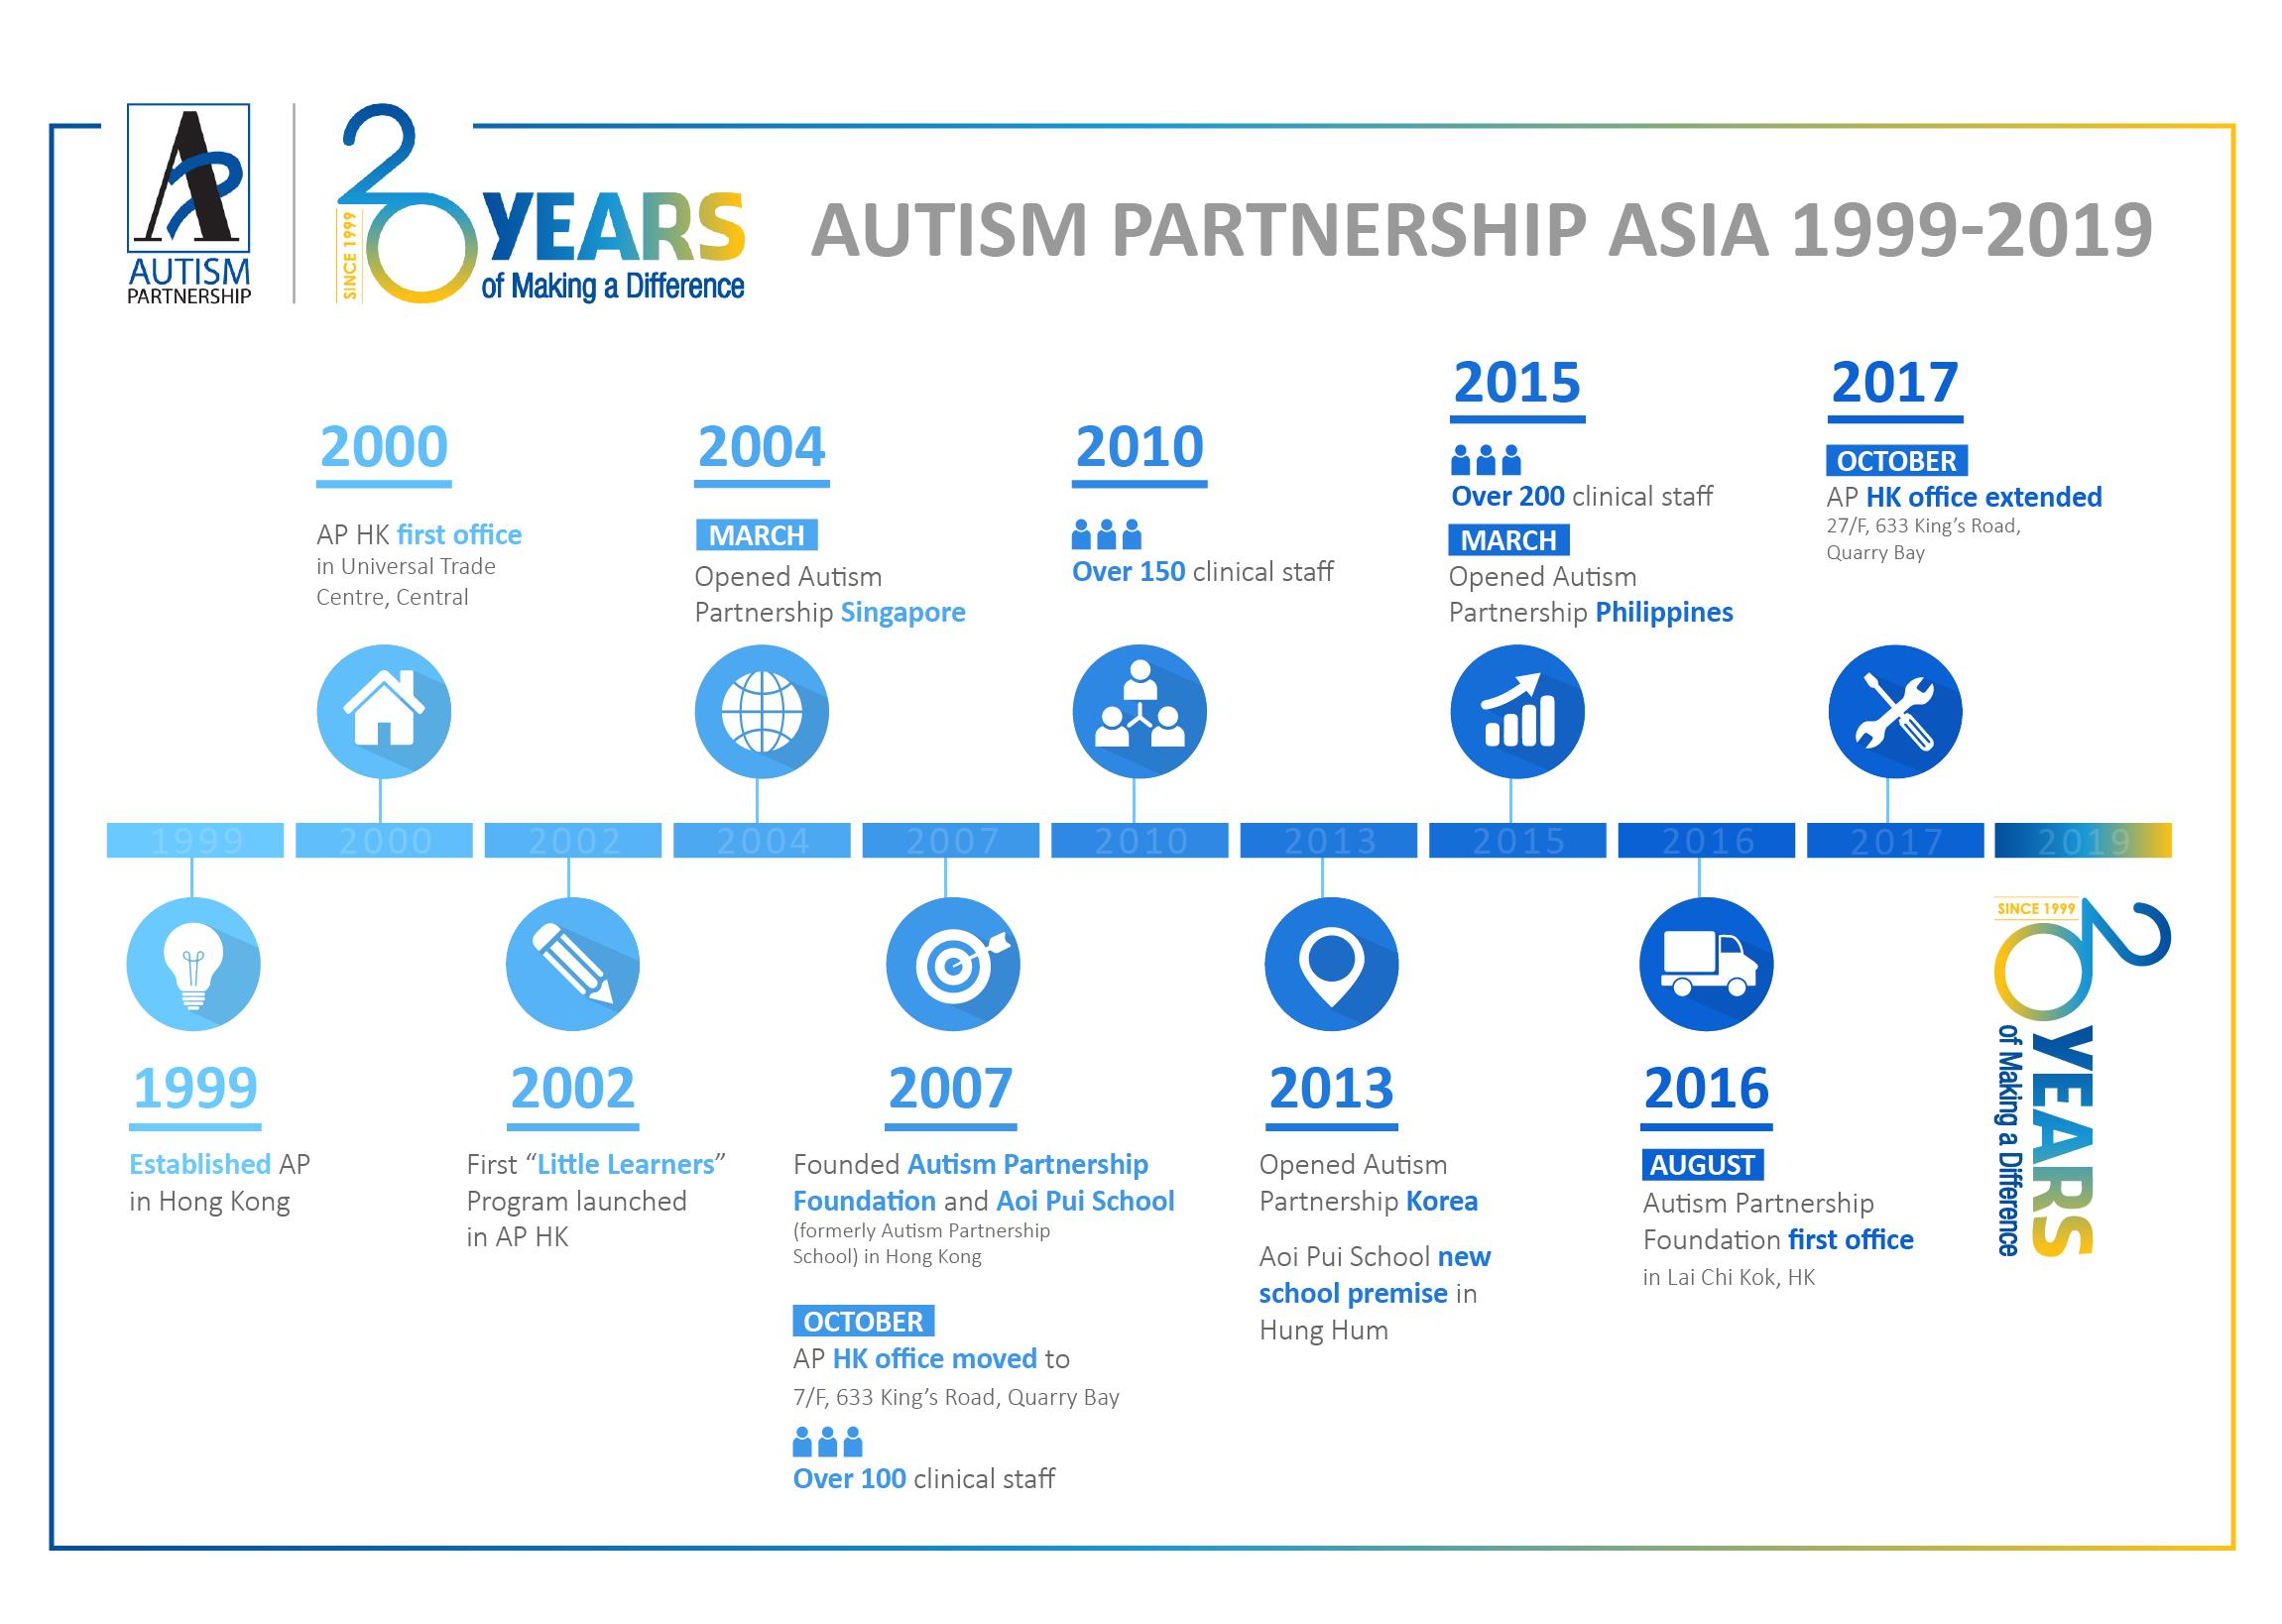 Autism Partnership Asia Timeline 1999-2019